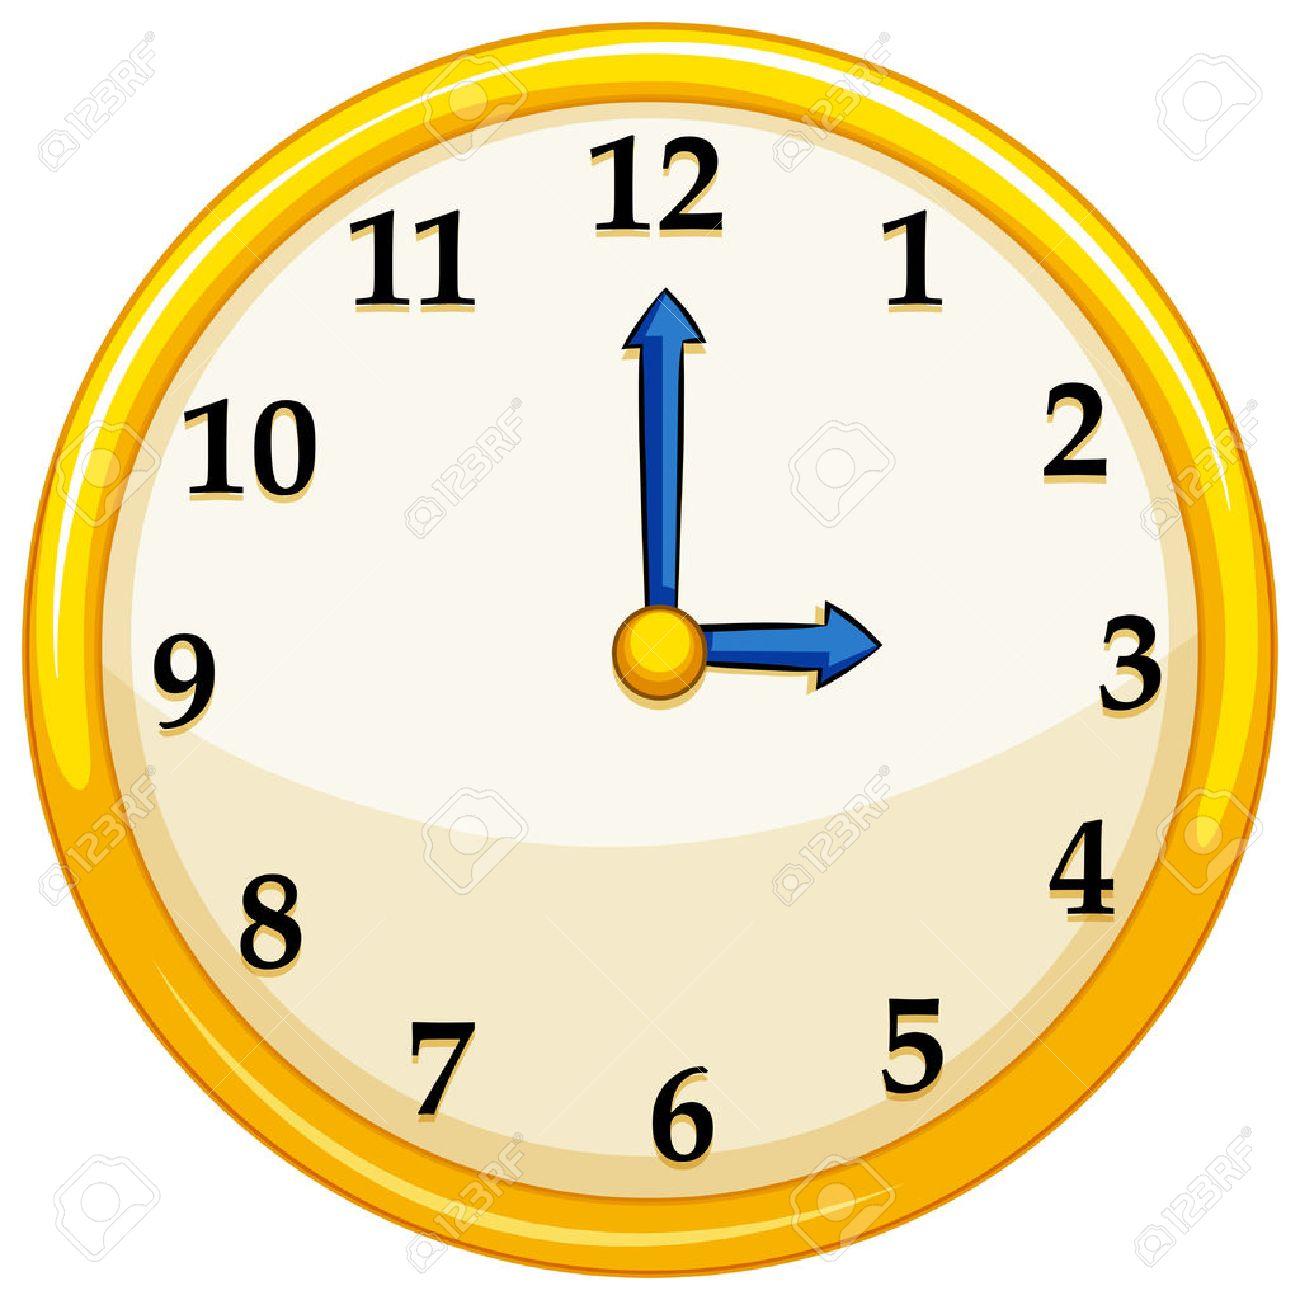 yellow round clock with blue needles illustration royalty free rh 123rf com Blank Clock Clip Art Blank Clock Clip Art